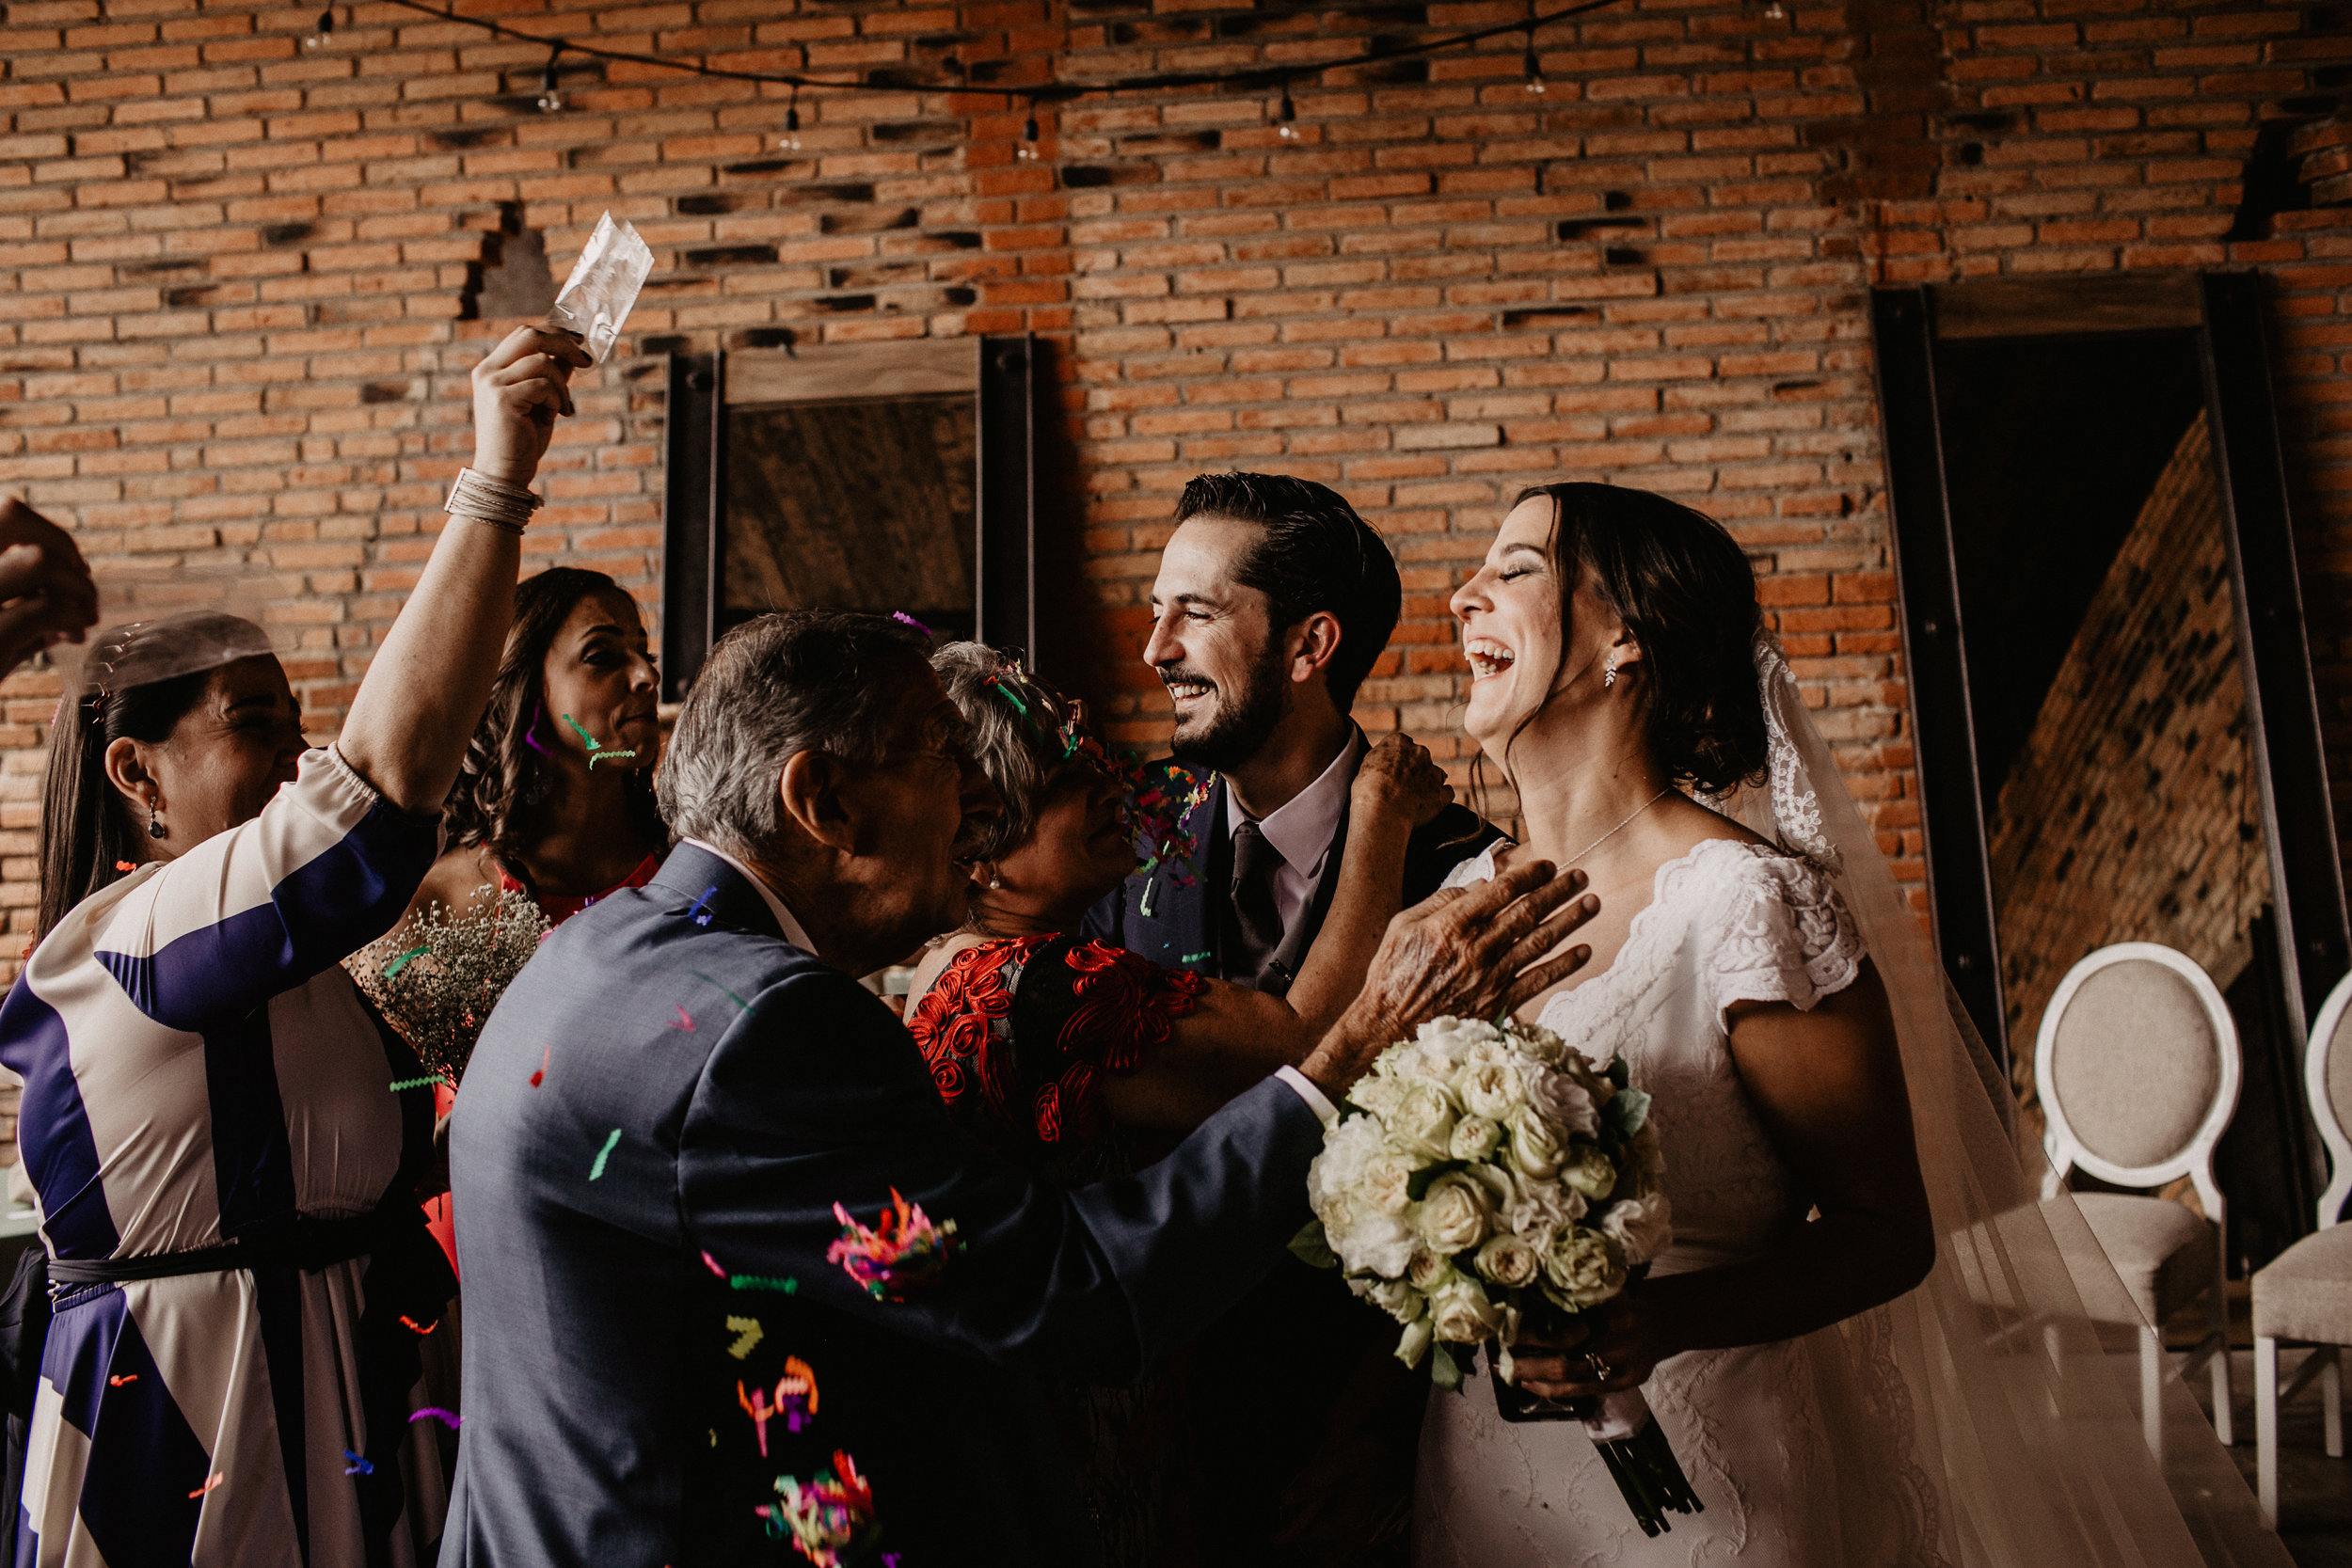 alfonso_flores_destination_wedding_photographer_pau_alonso_665.JPG